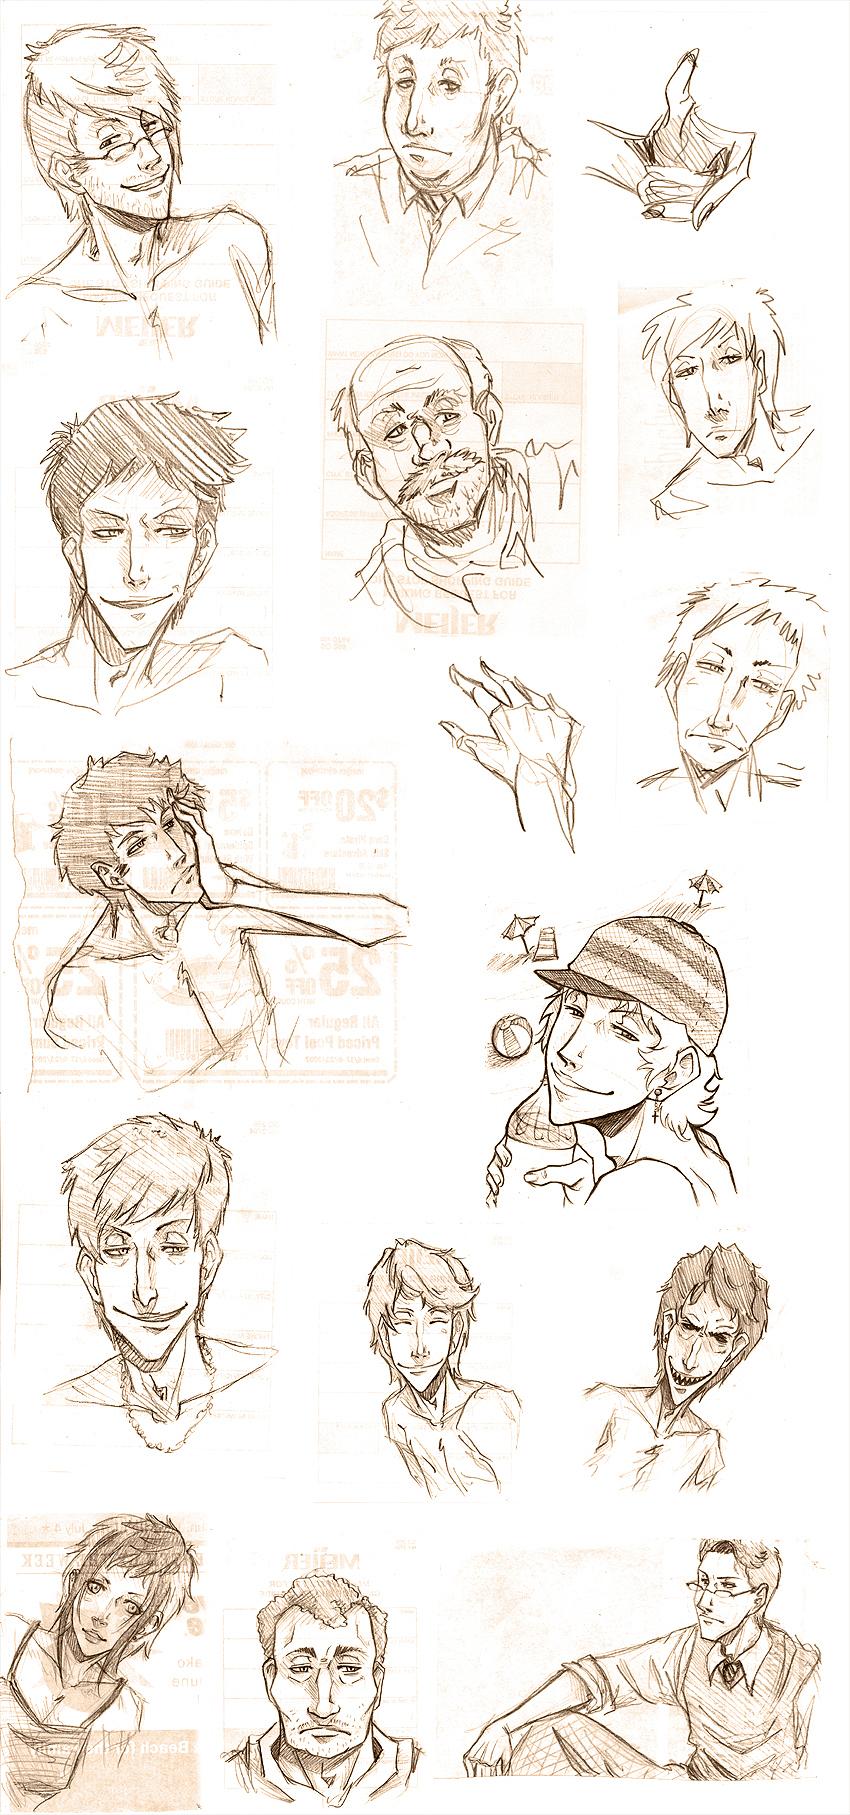 - Sketch Dumpage - by coreymill